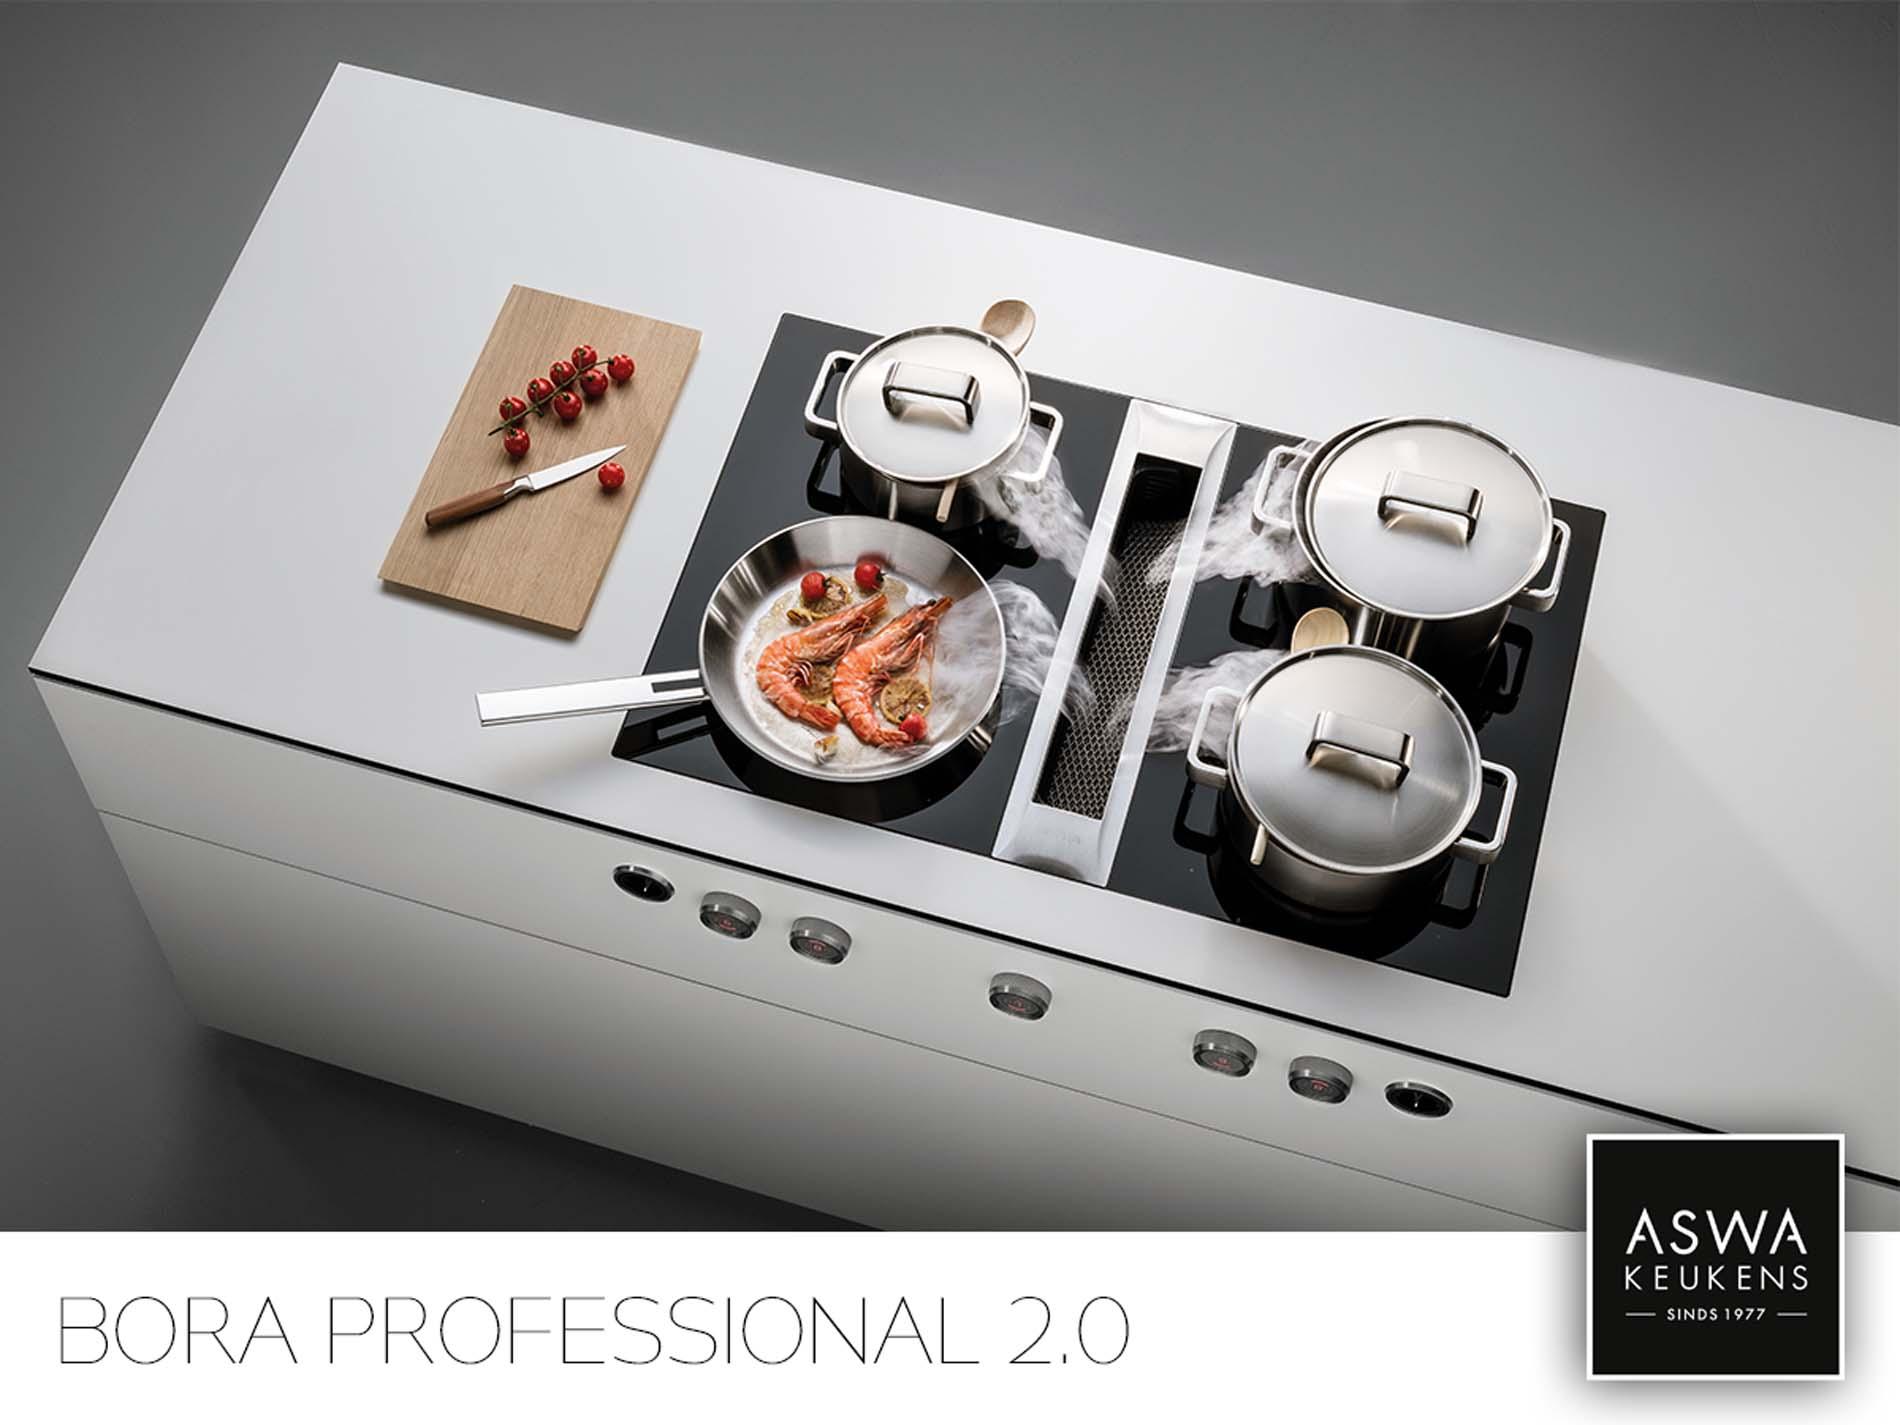 BORA Professional 2.0, BORA Kookplaat met afzuiging, ASWA Keukens